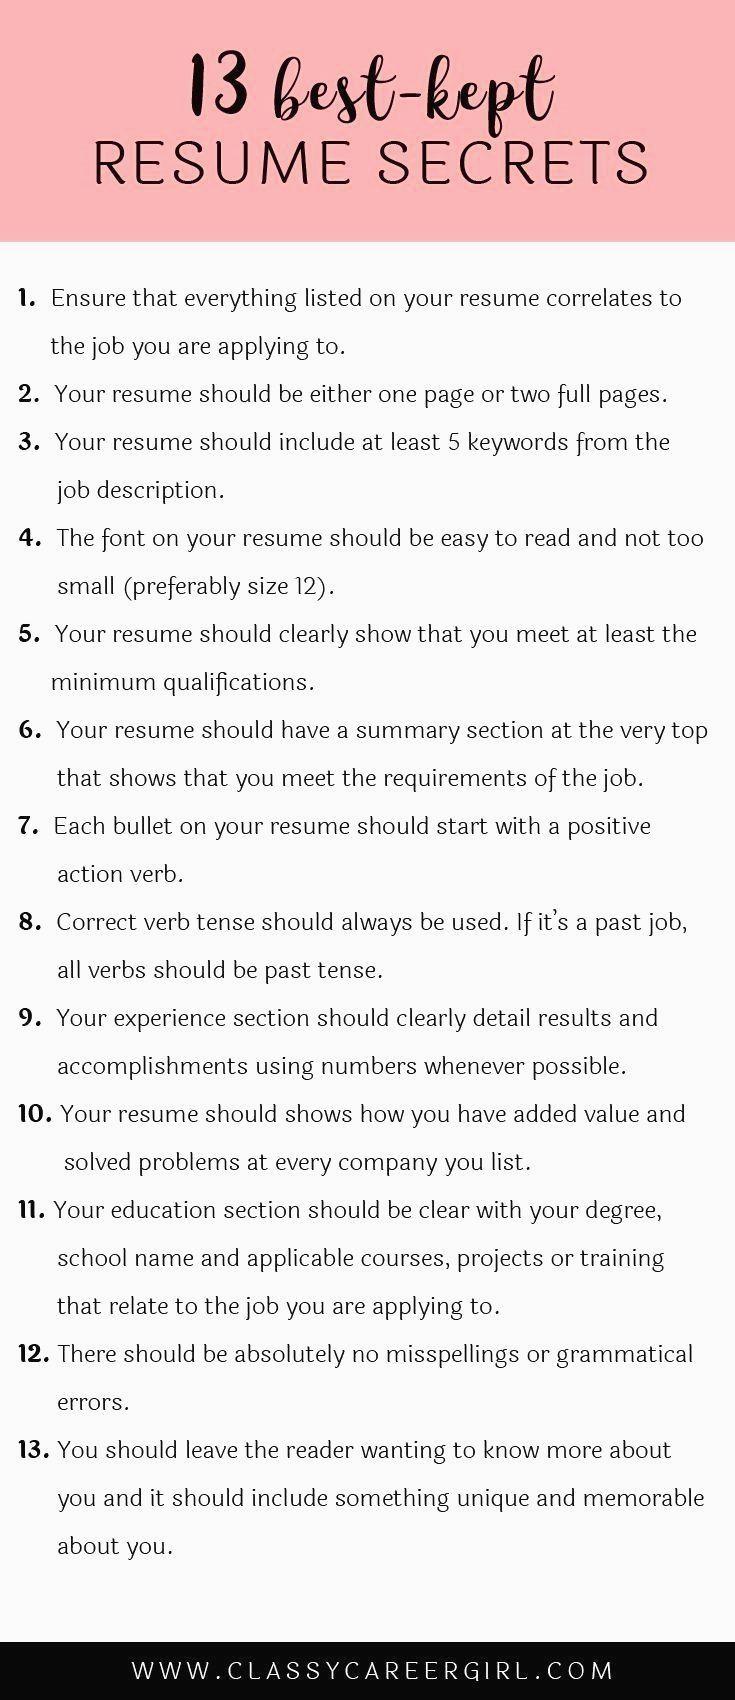 59 free resume job skills 2020 in 2020 resume tips no